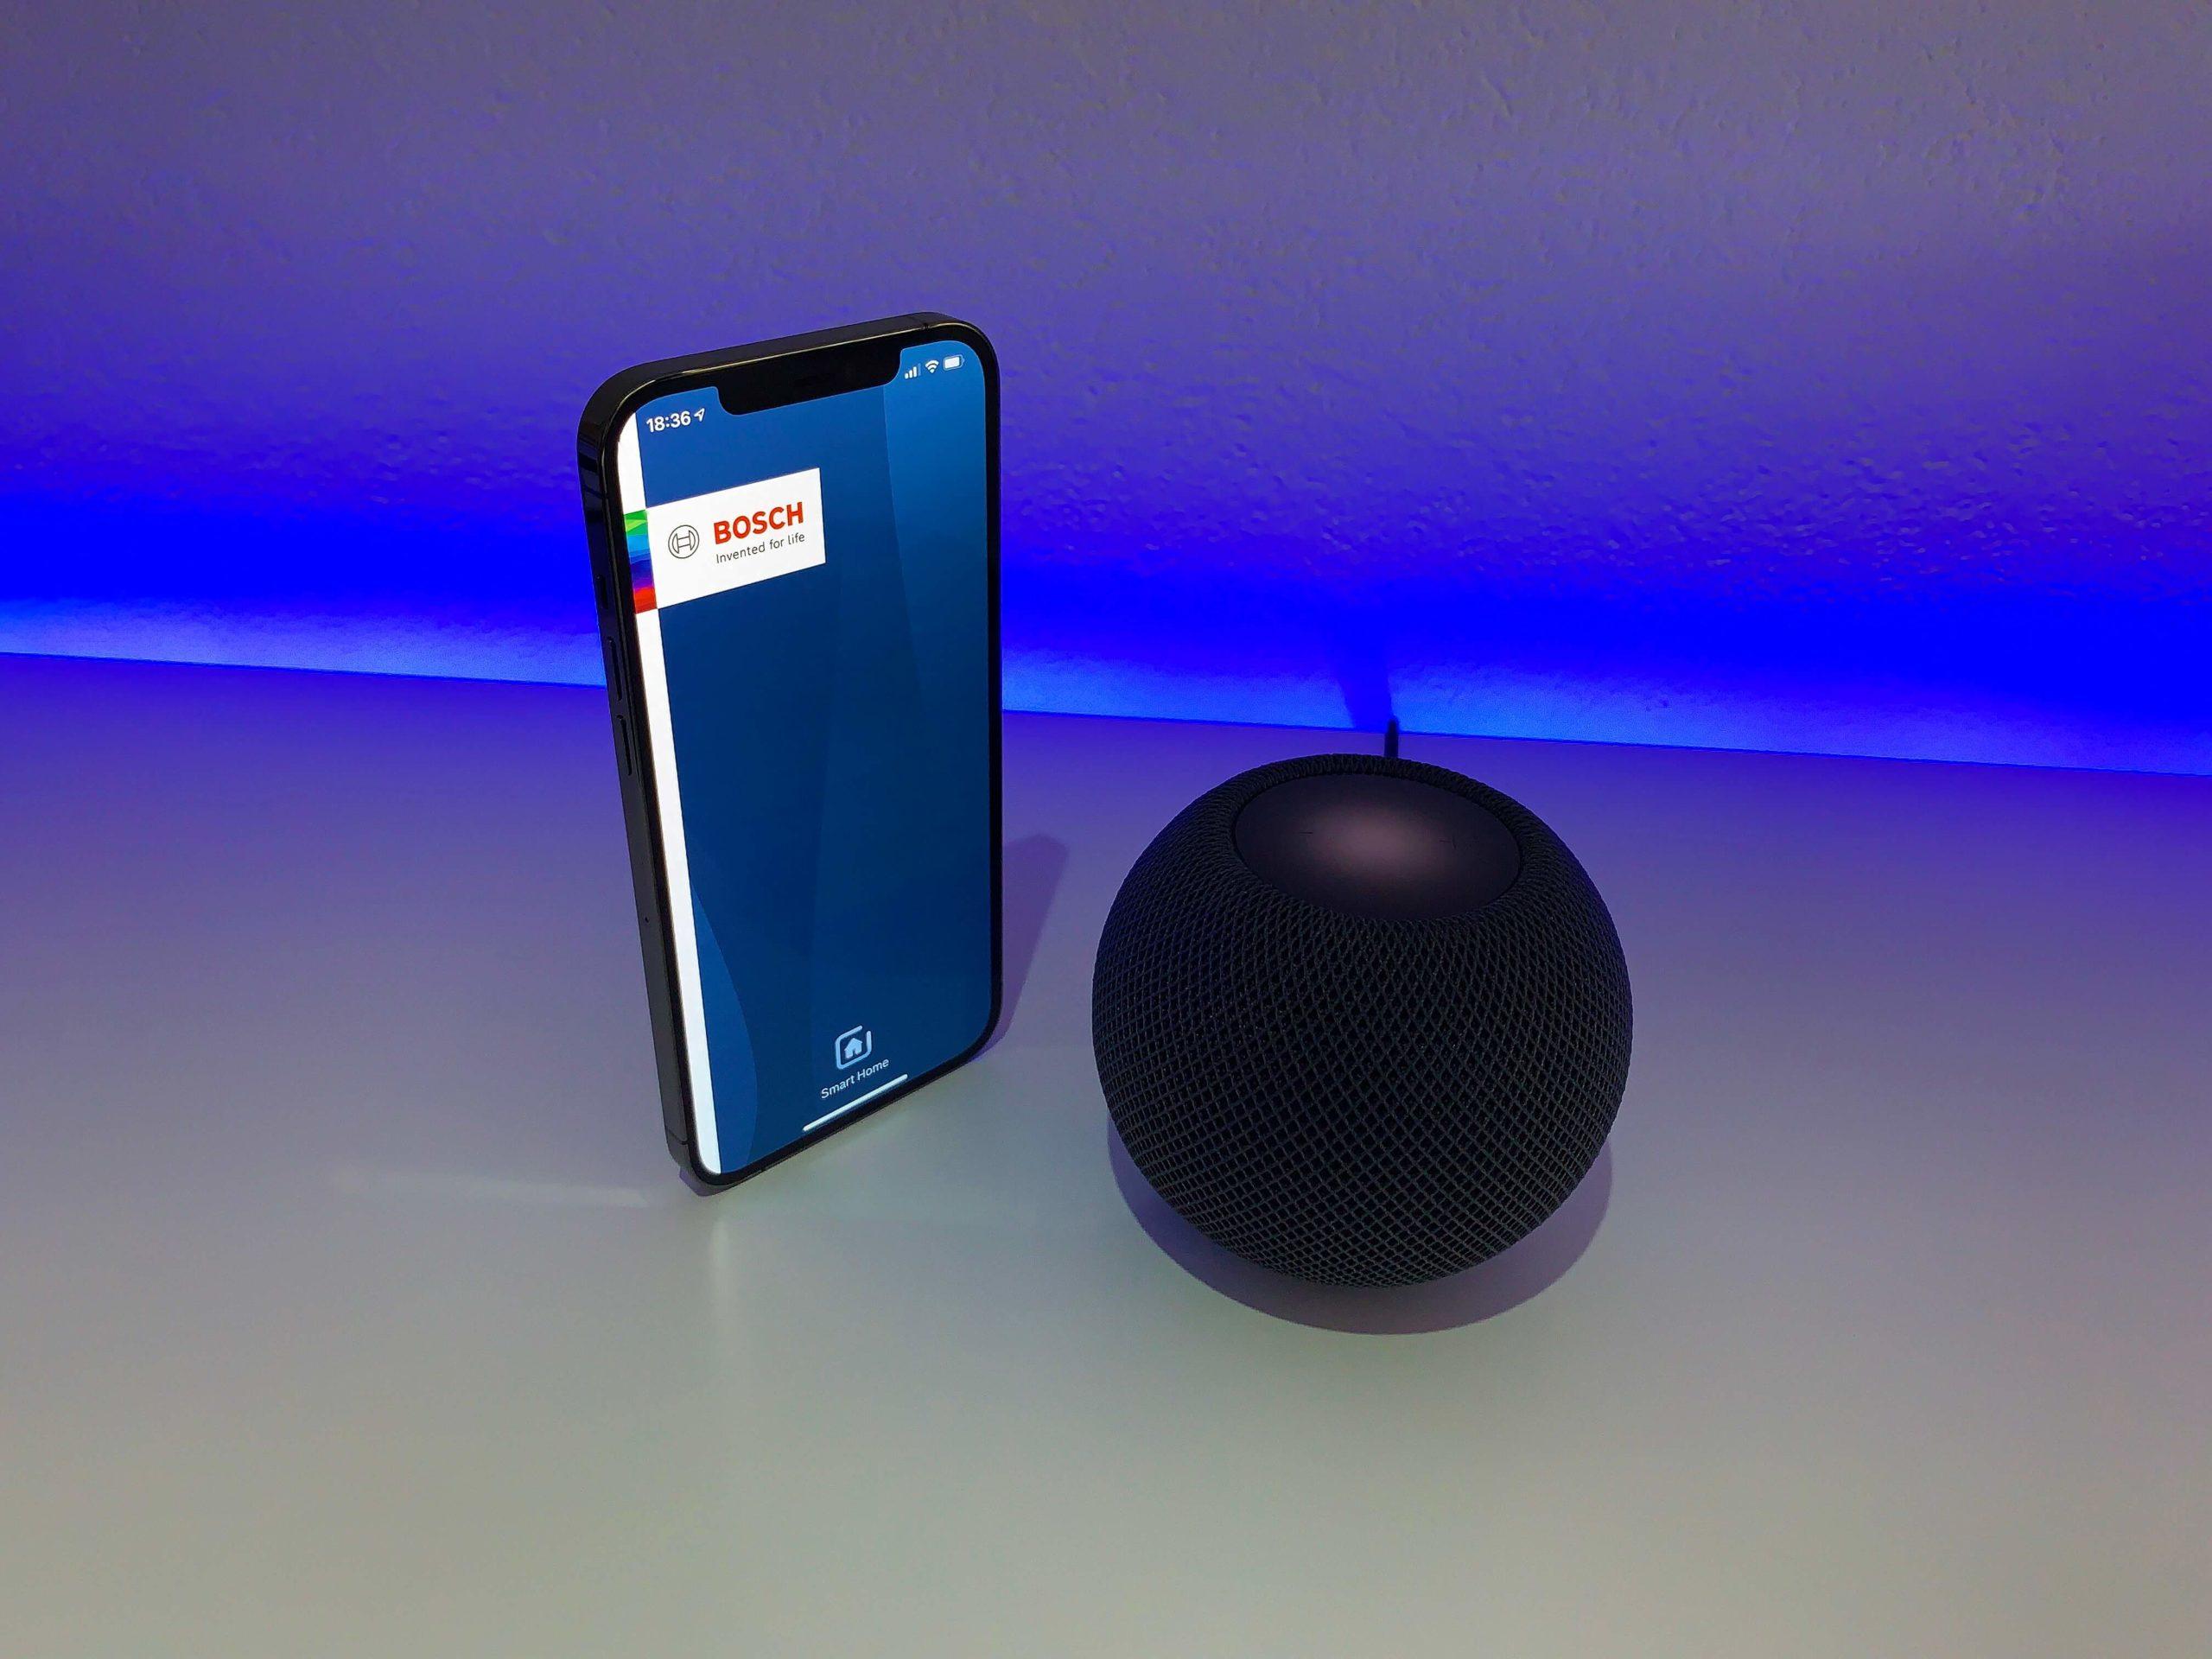 Bosch-Smart-Home-in-Perfektion-mit-Apple-HomeKit1-scaled Bosch Smart Home - in Perfektion mit Apple HomeKit